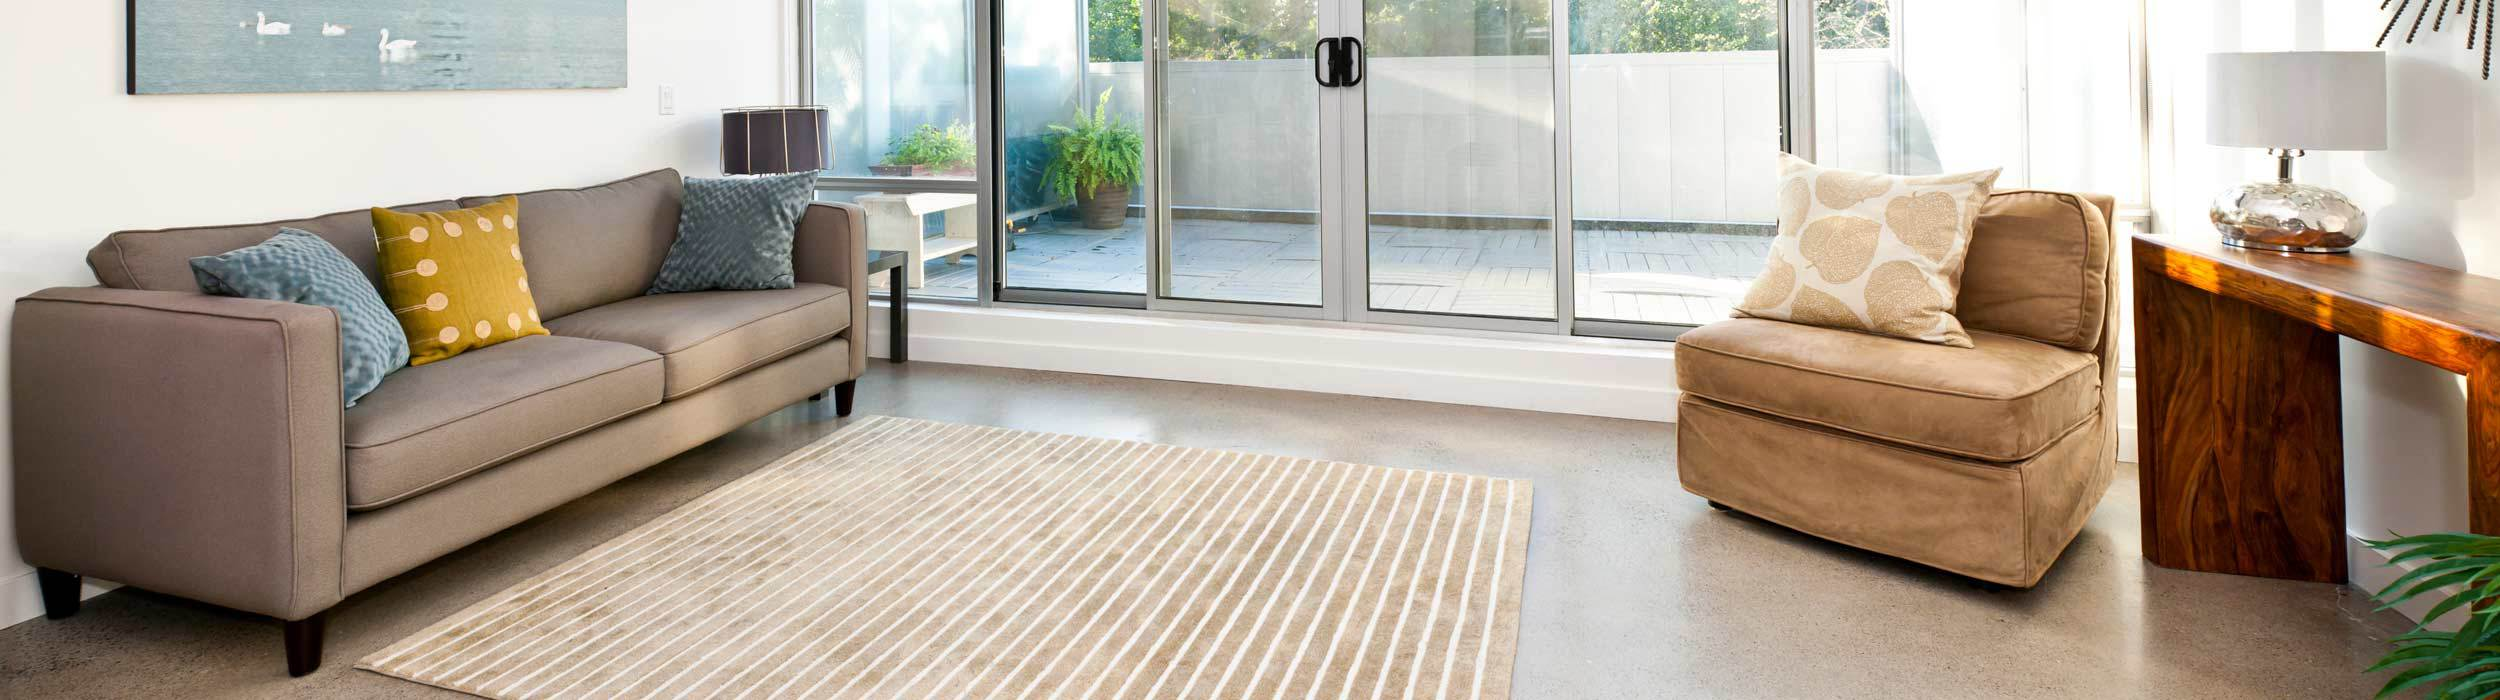 Carpets North West | M6 Carpets Haydock Ltd